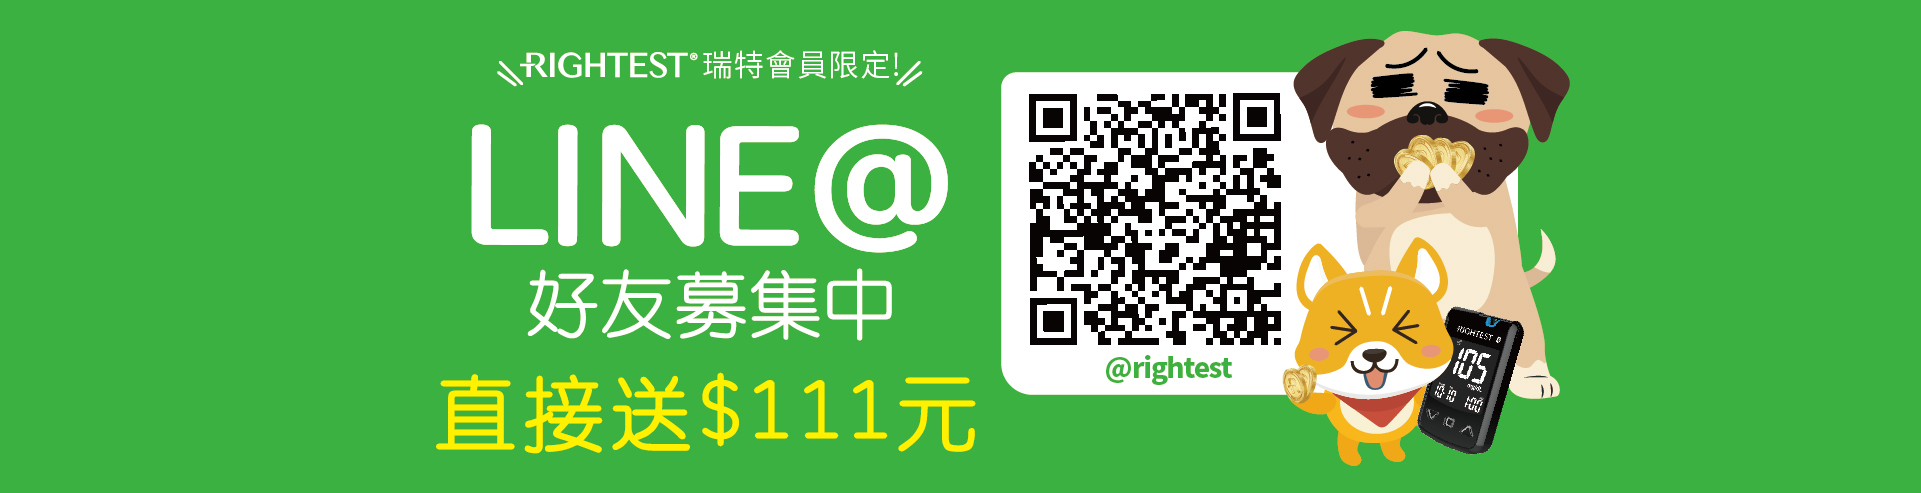 proimages/line_加好友-官網.jpg